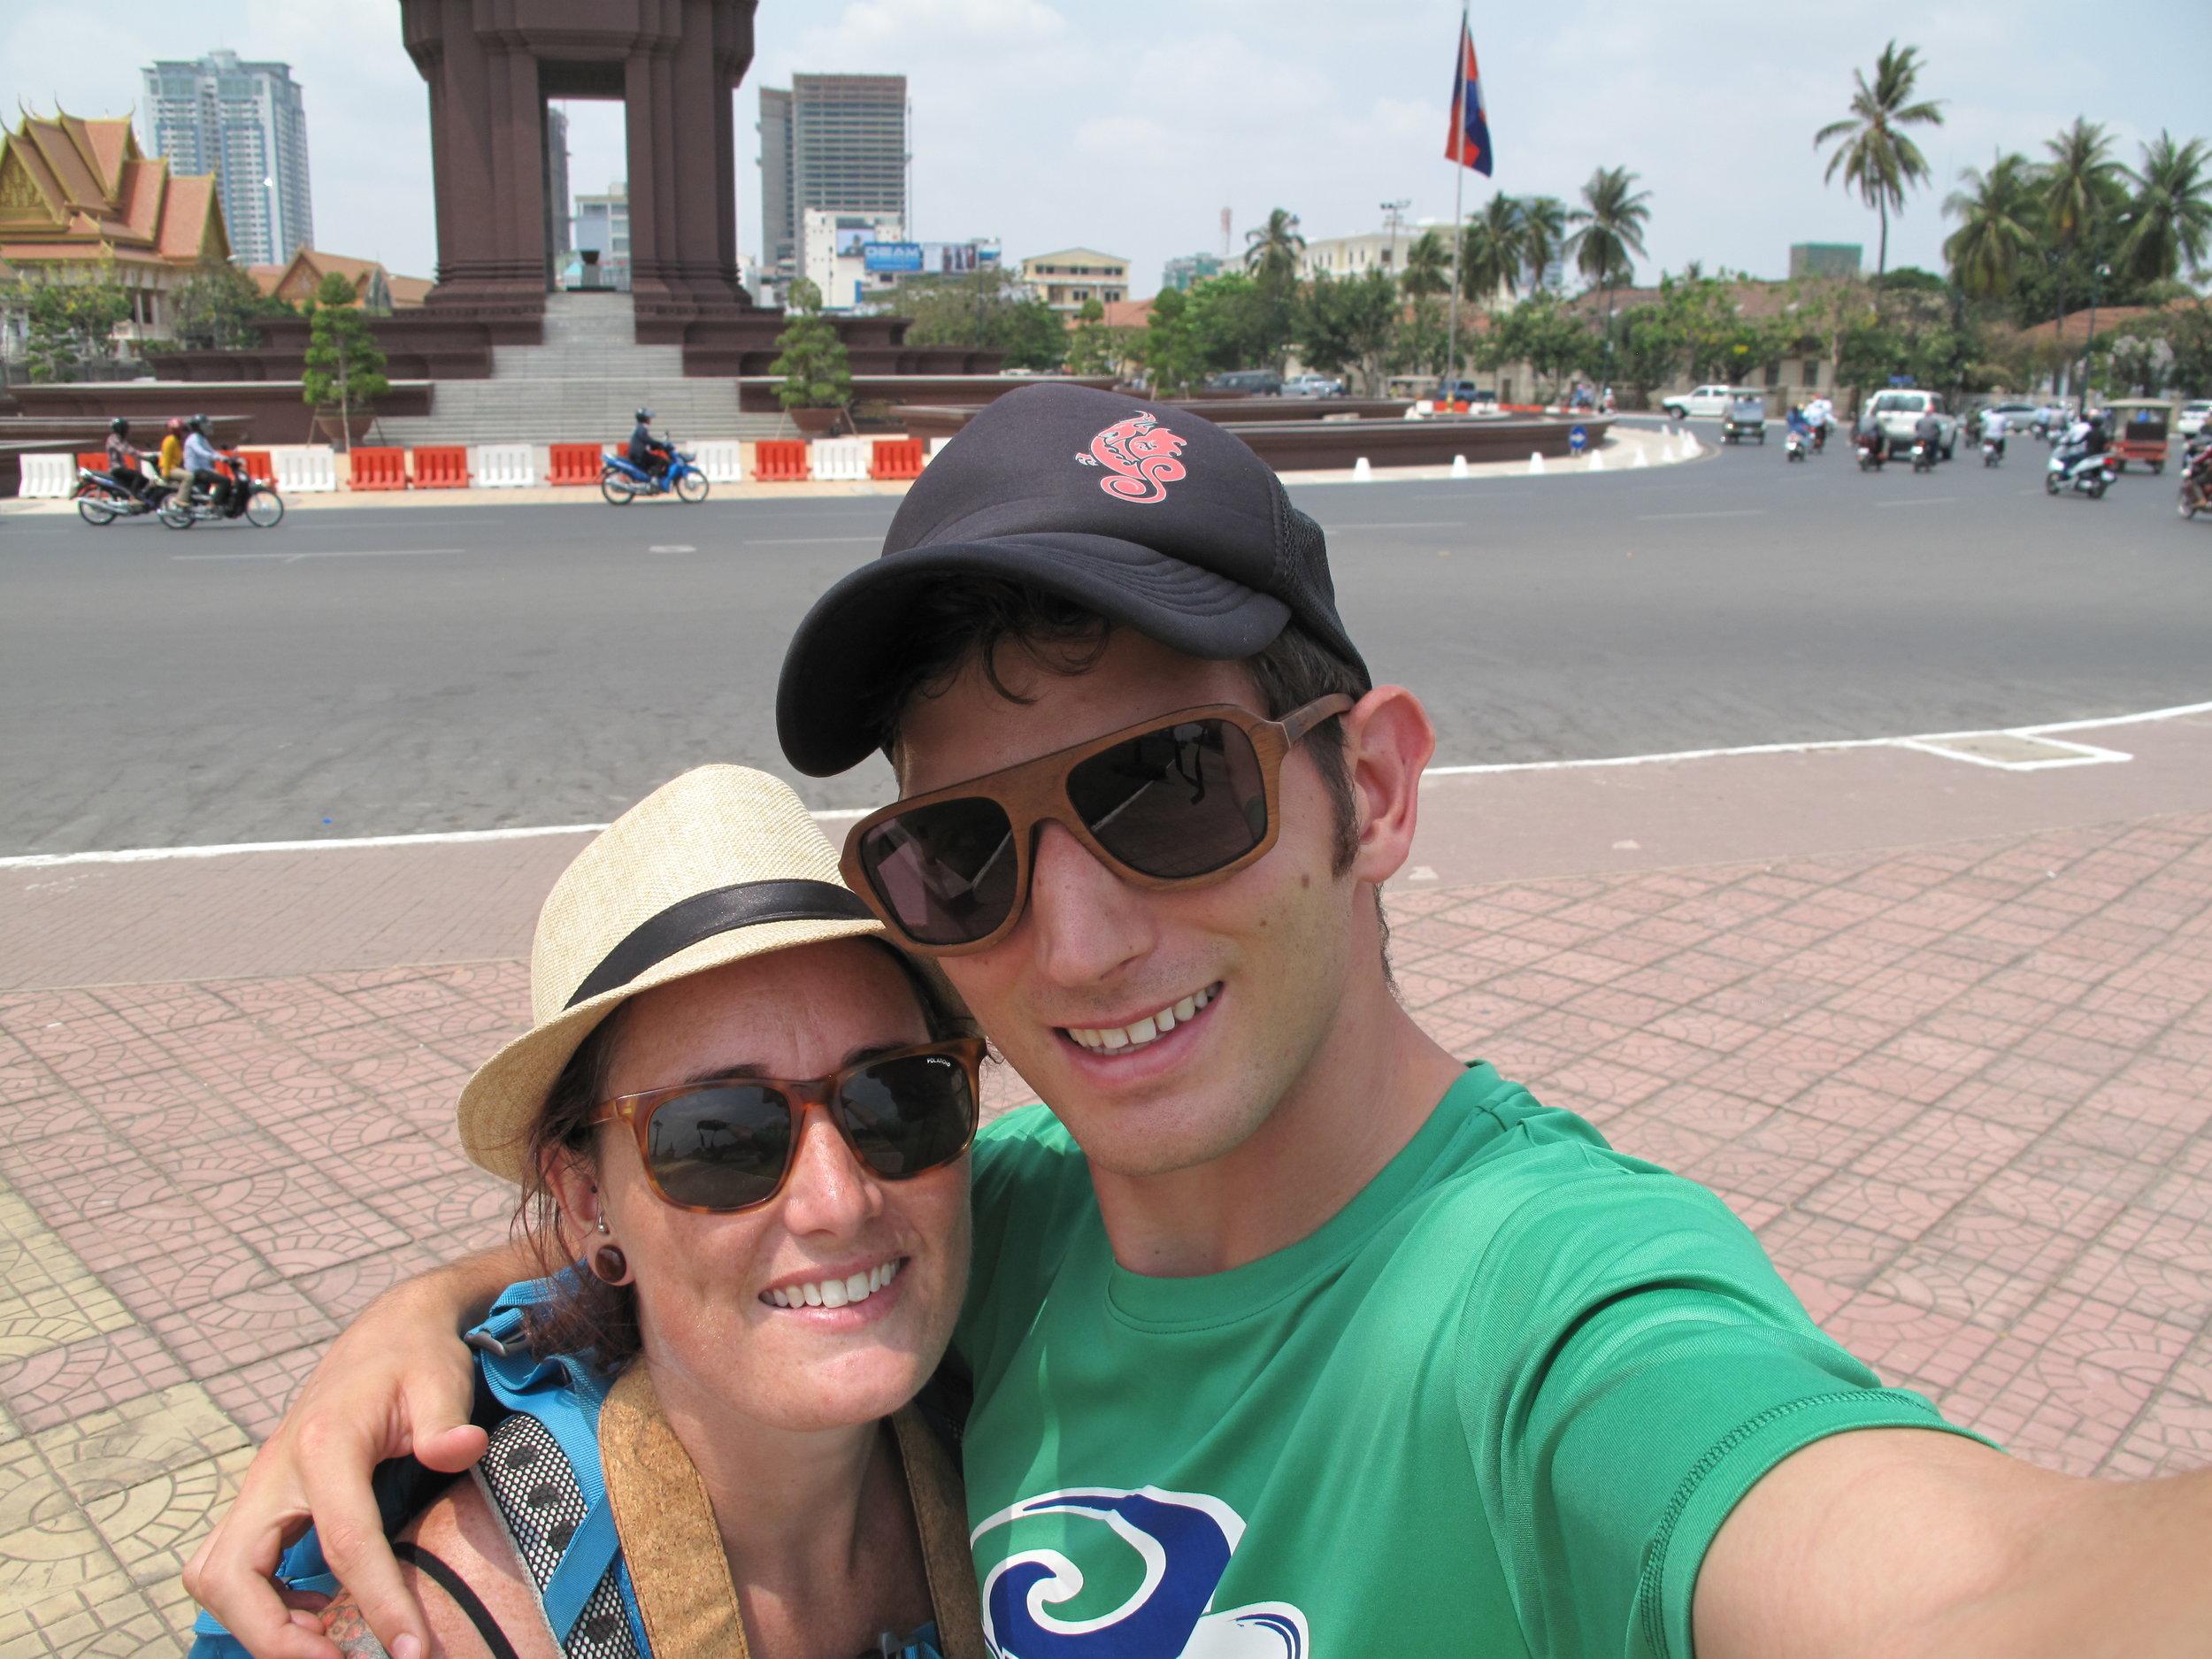 Roundabout selfie, Phnom Penh